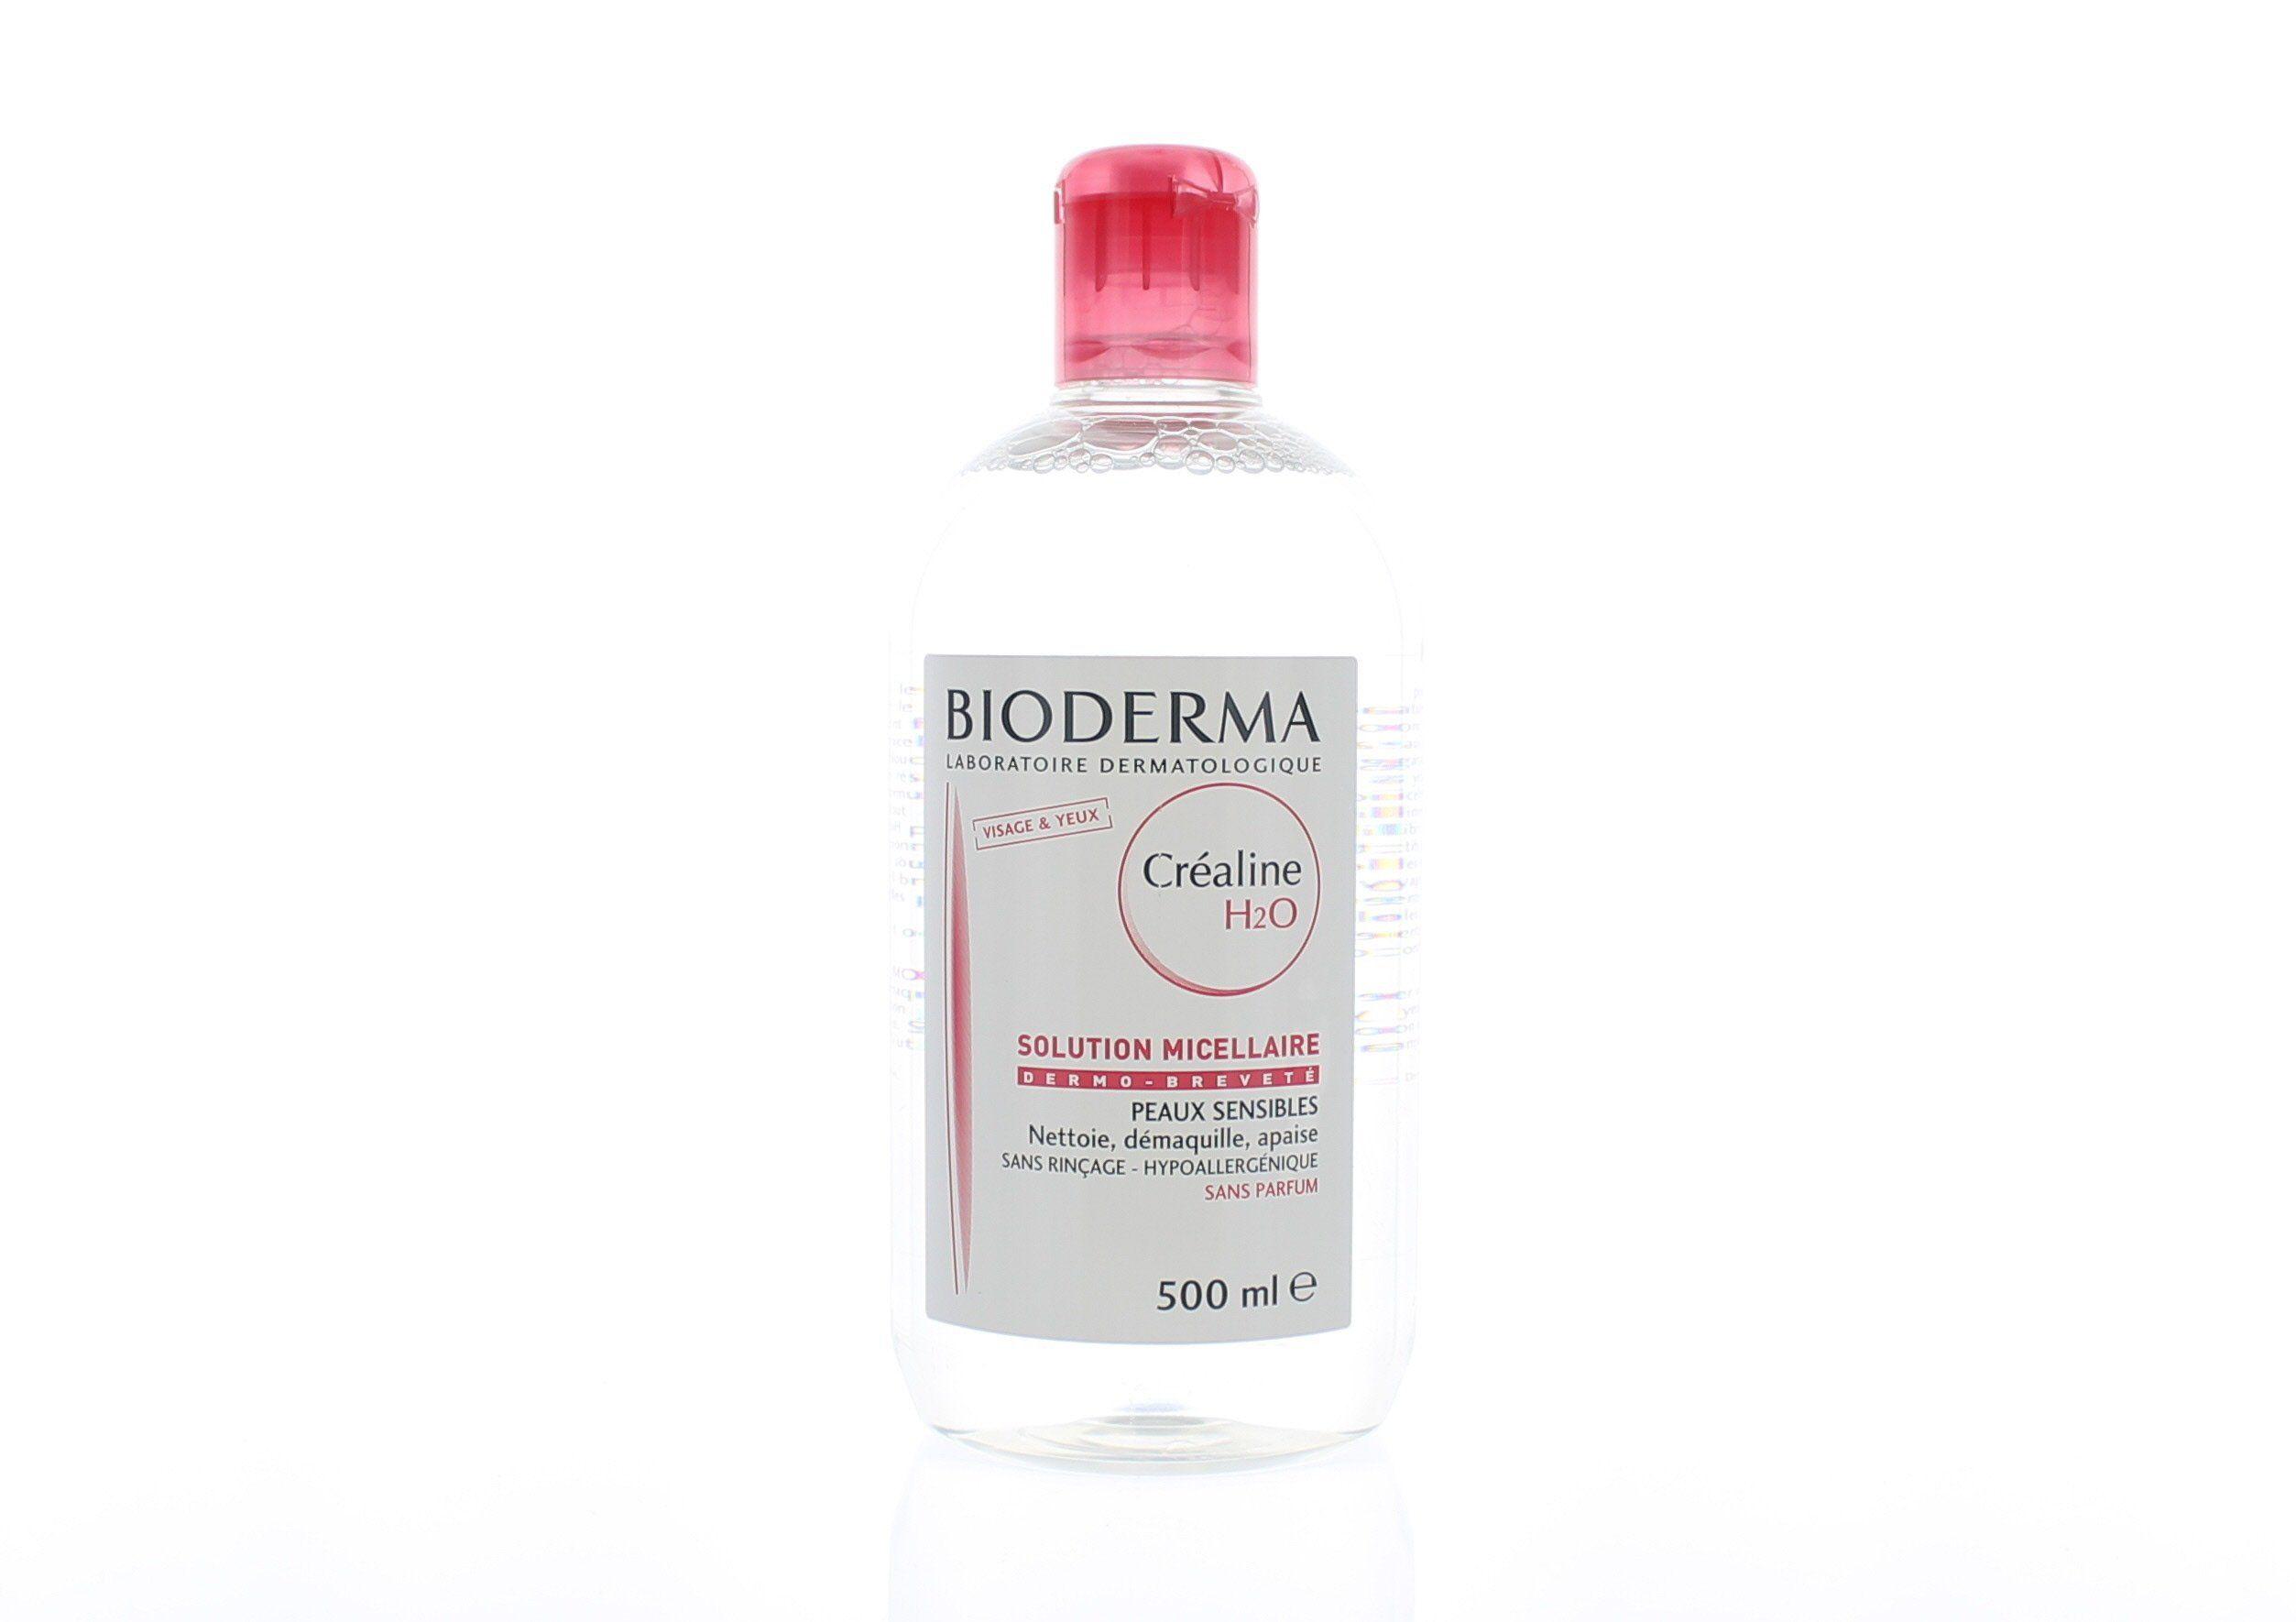 Bioderma Crealine H2O Micelle Solution 500ml Bioderma